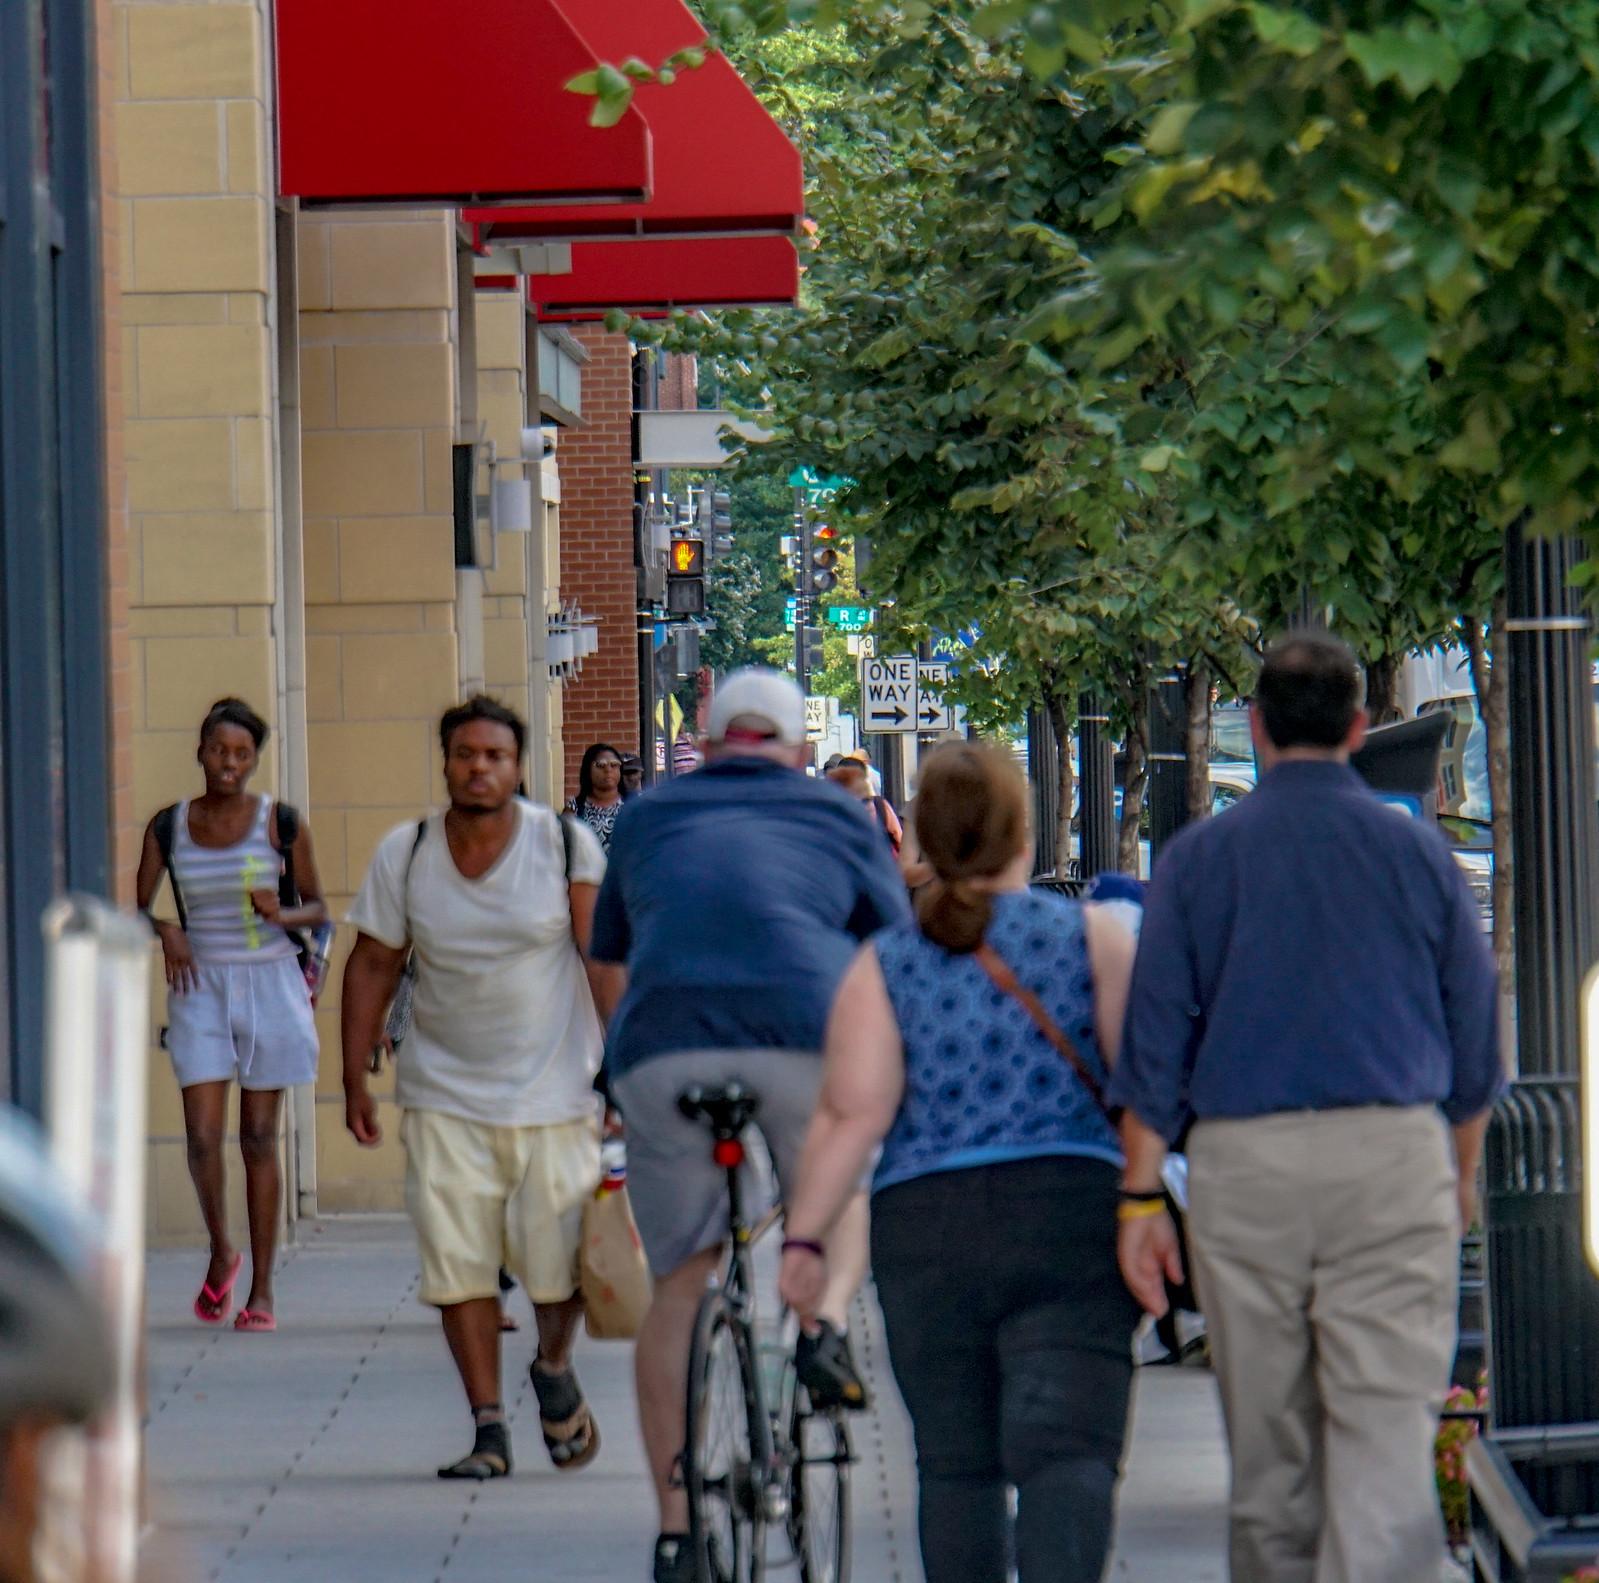 2017.08.29 Shaw Neighborhood, Washington, DC USA 8315